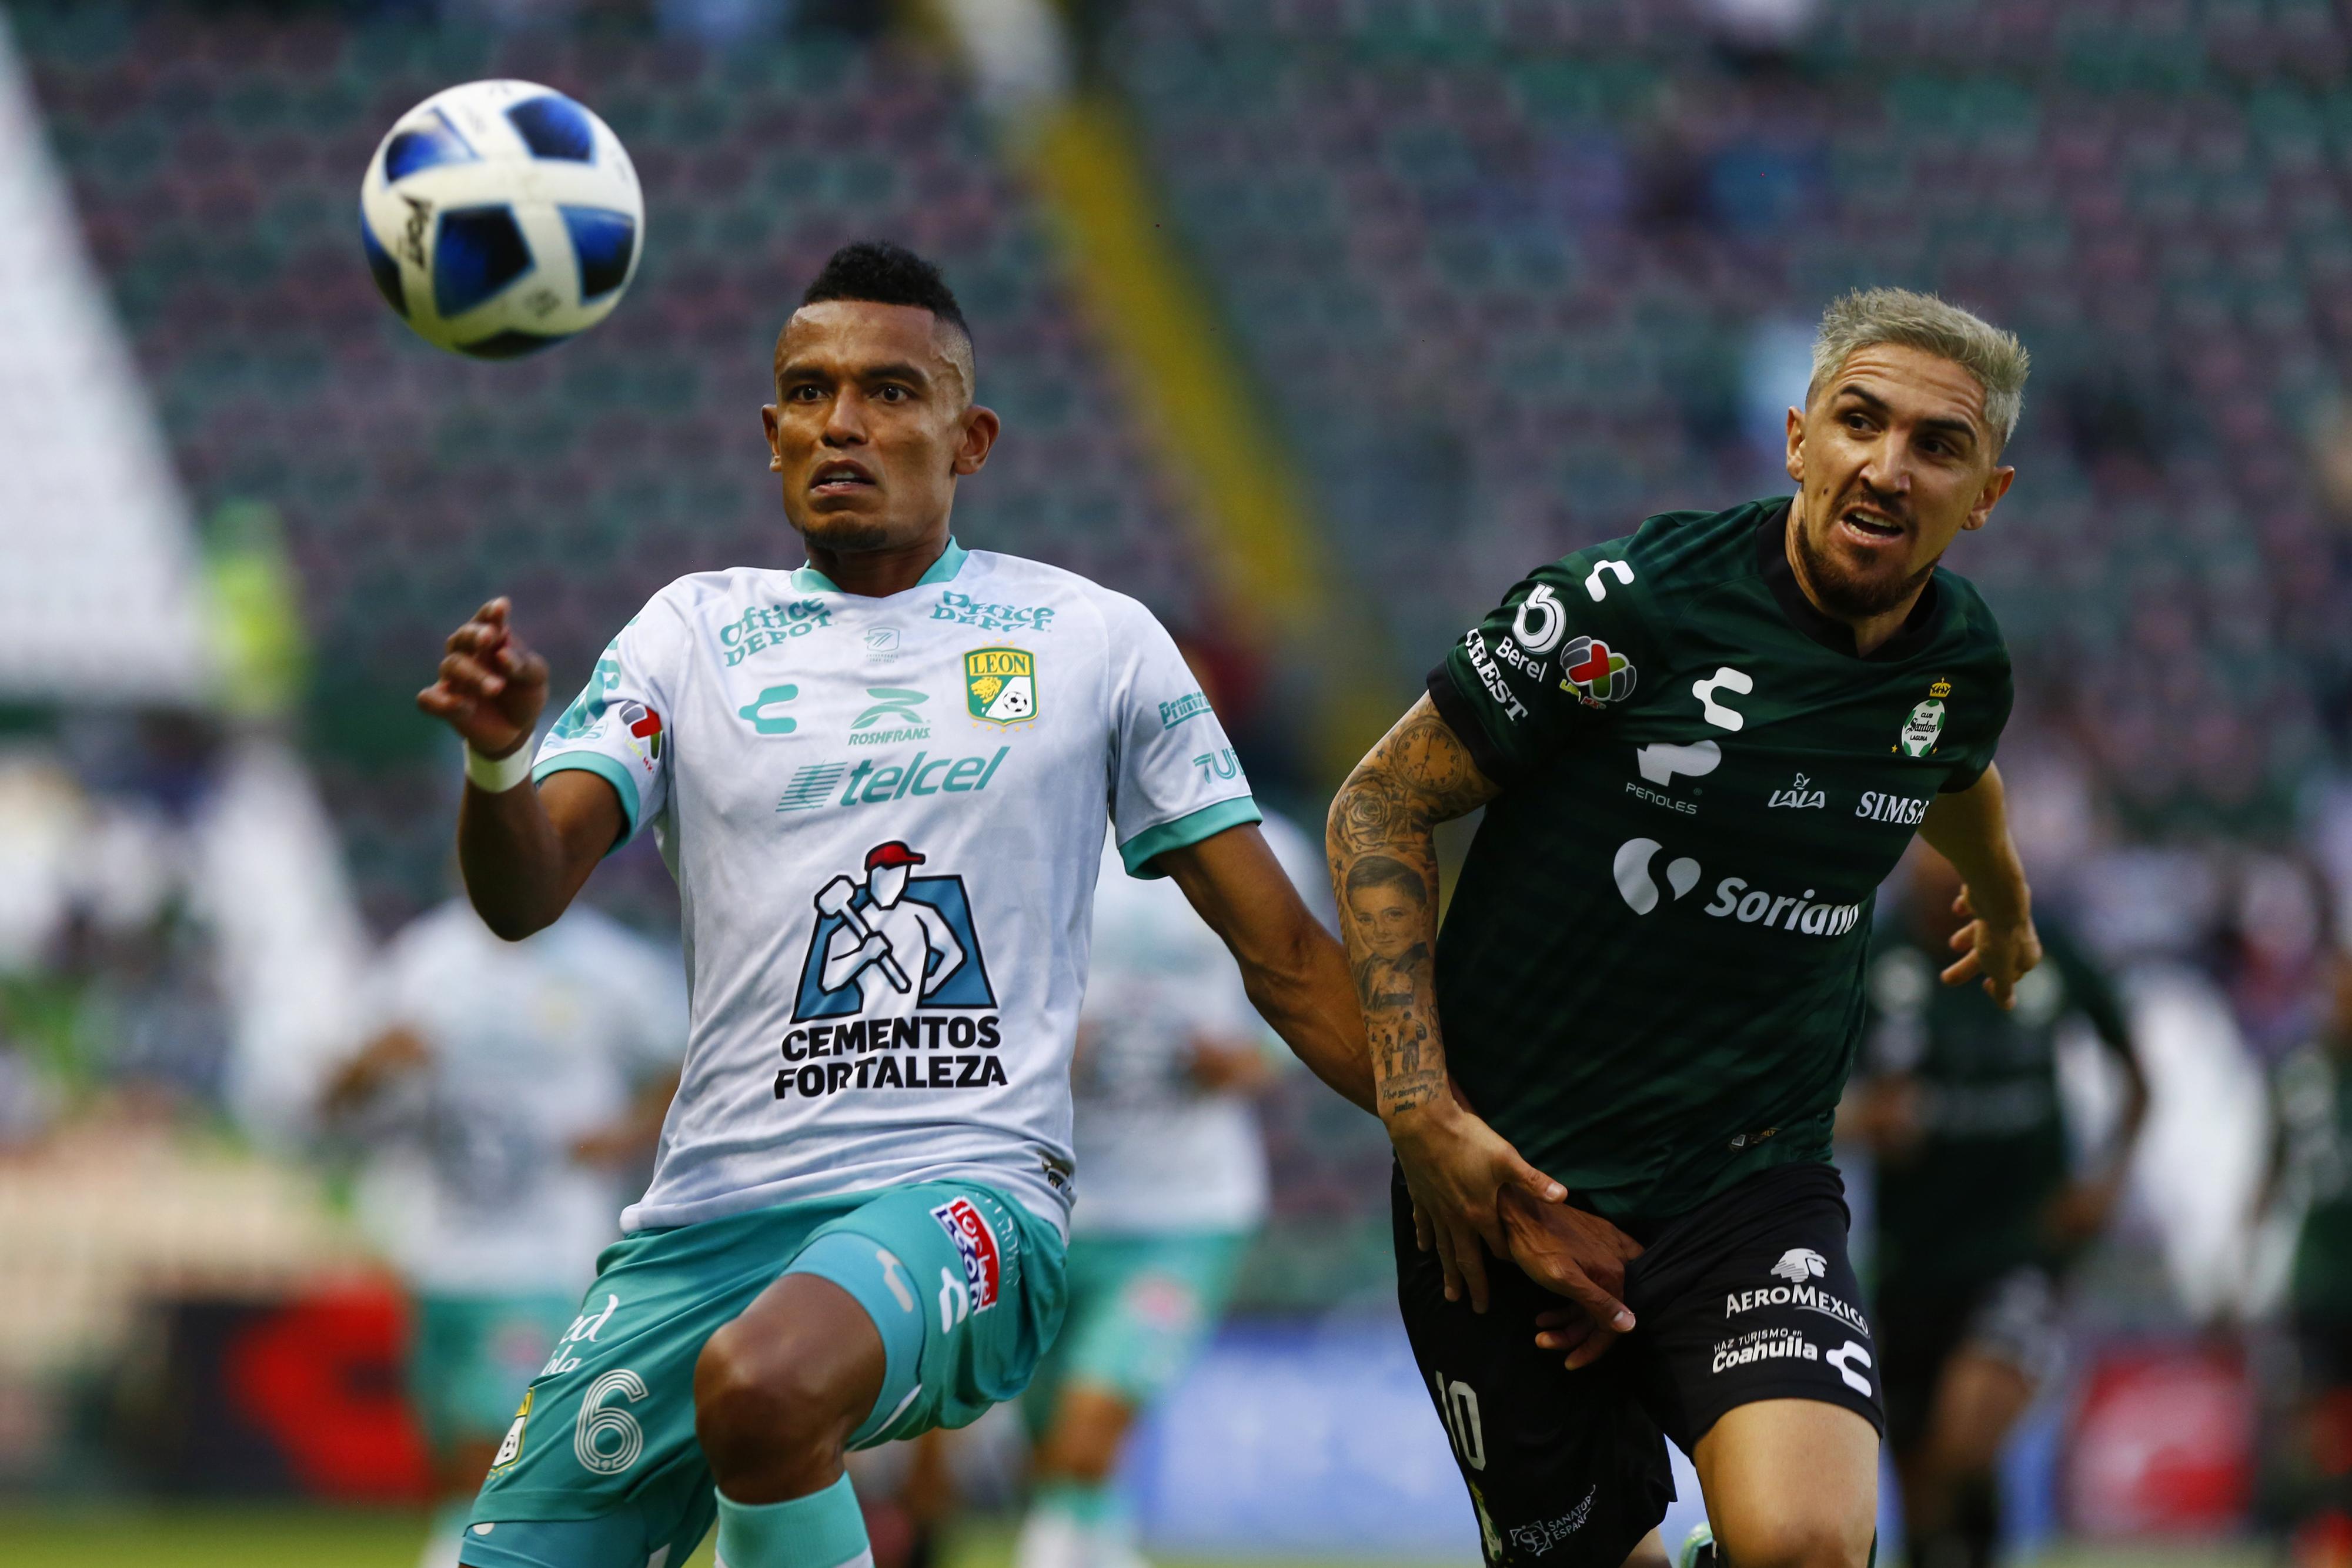 Leon v Santos Laguna - Torneo Apertura 2021 Liga MX